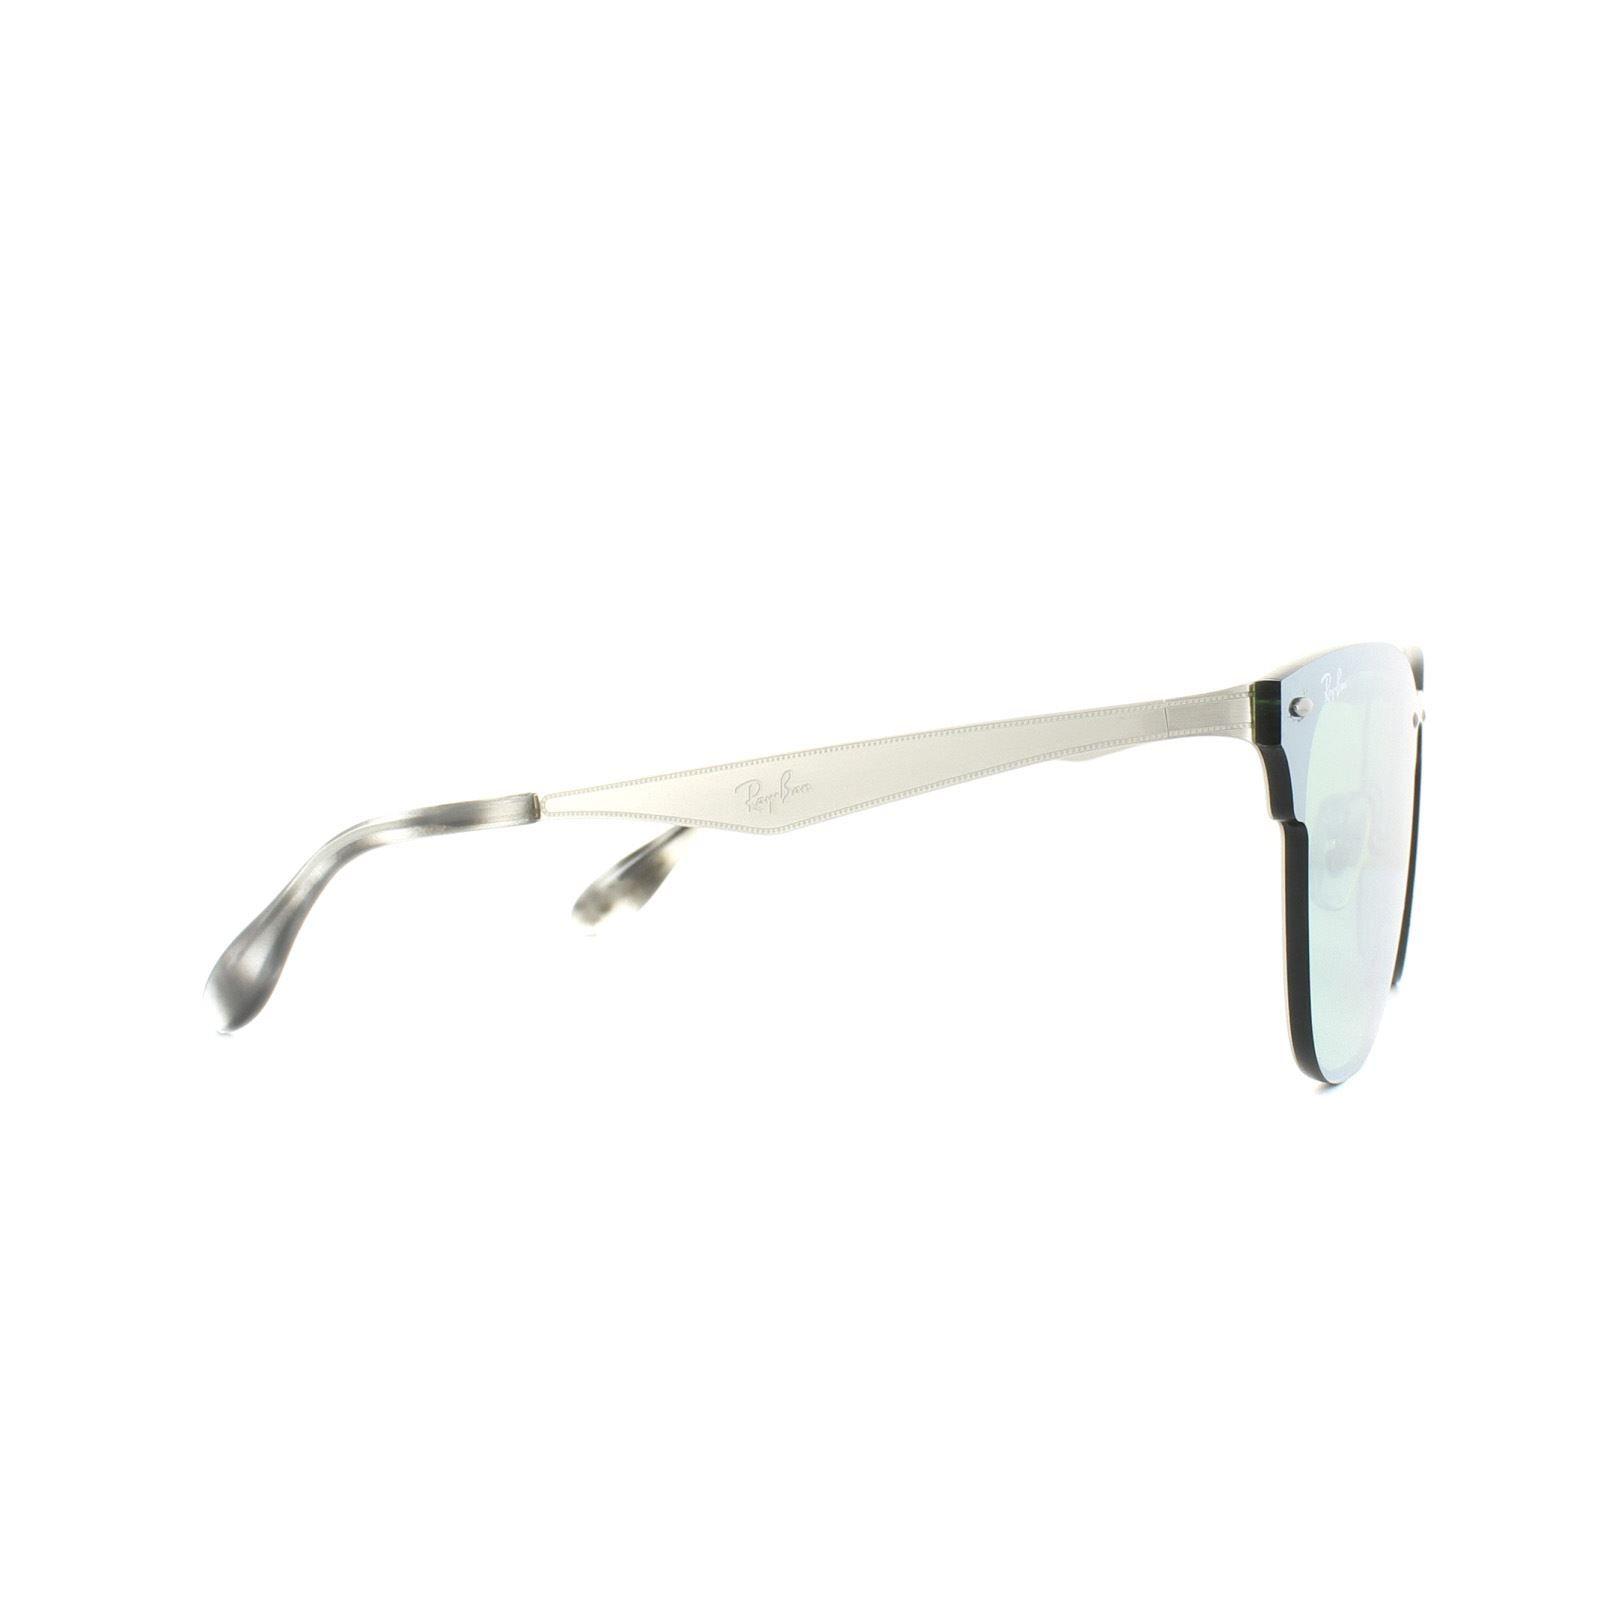 Ray-Ban Sunglasses Blaze Clubmaster 3576N 042/30 Silver Dark Green Silver Mirror Small